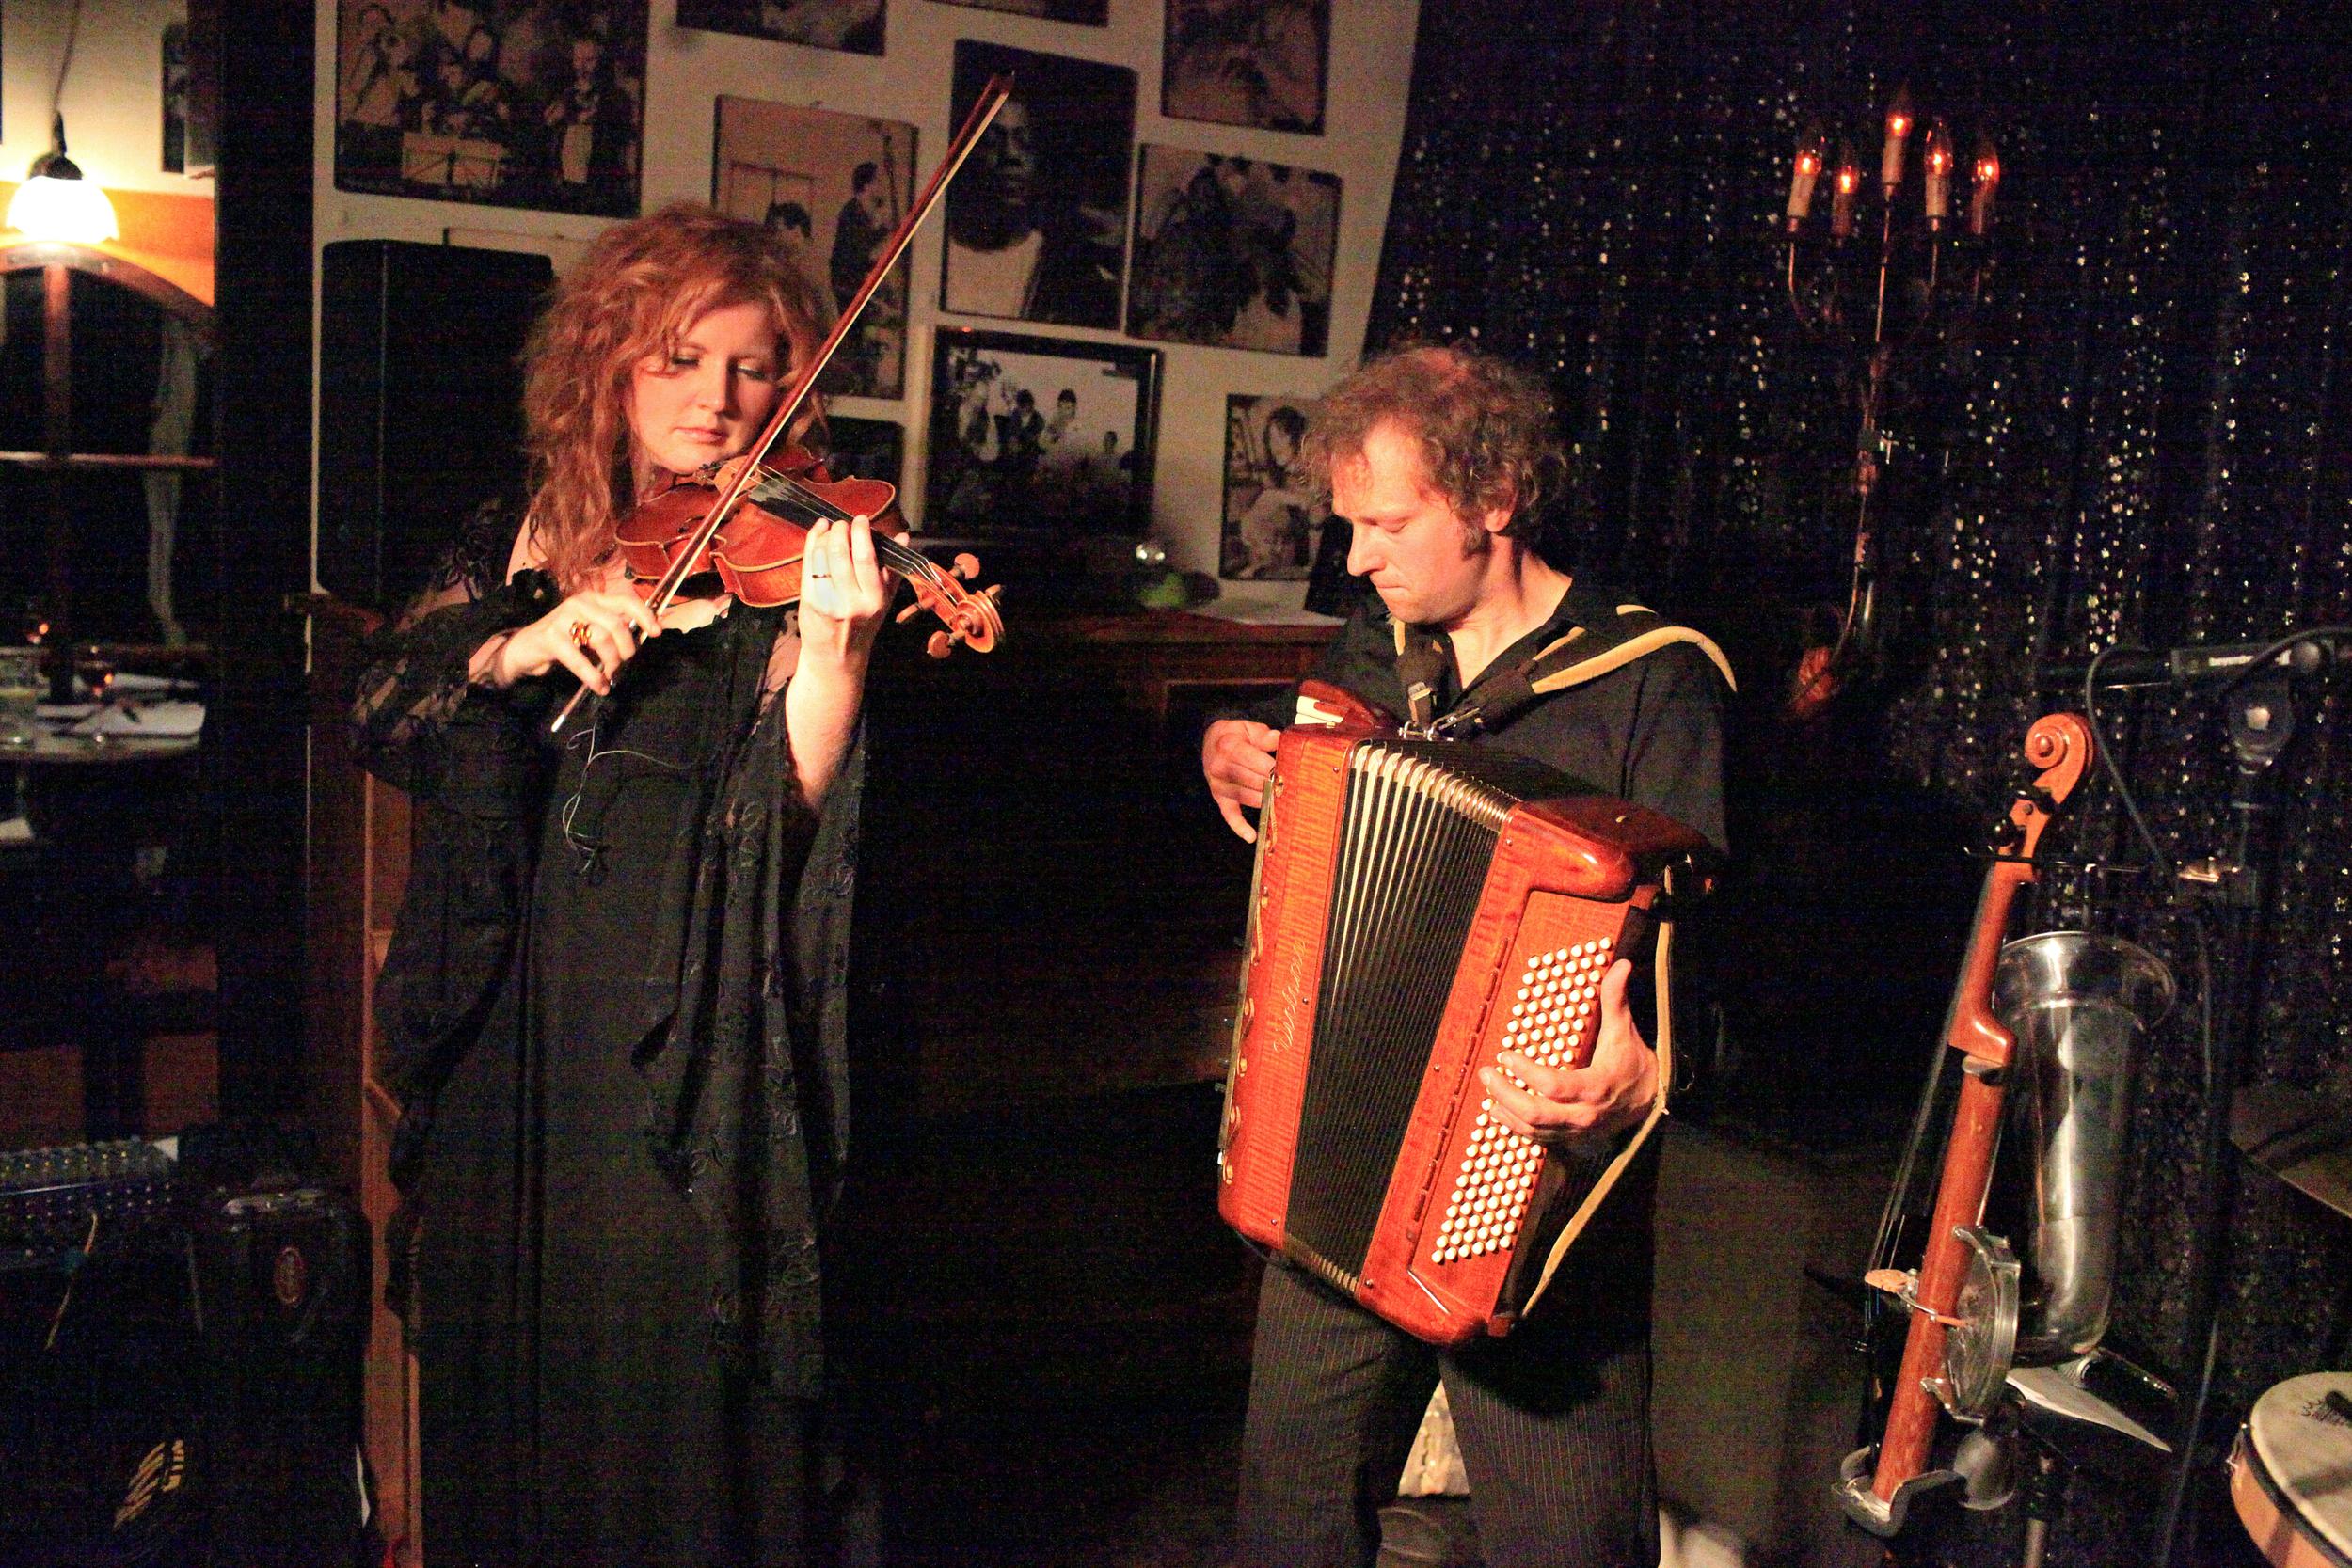 Martina Eisenreich & Andreas Hinterseher (live). Photo: Le Pirate